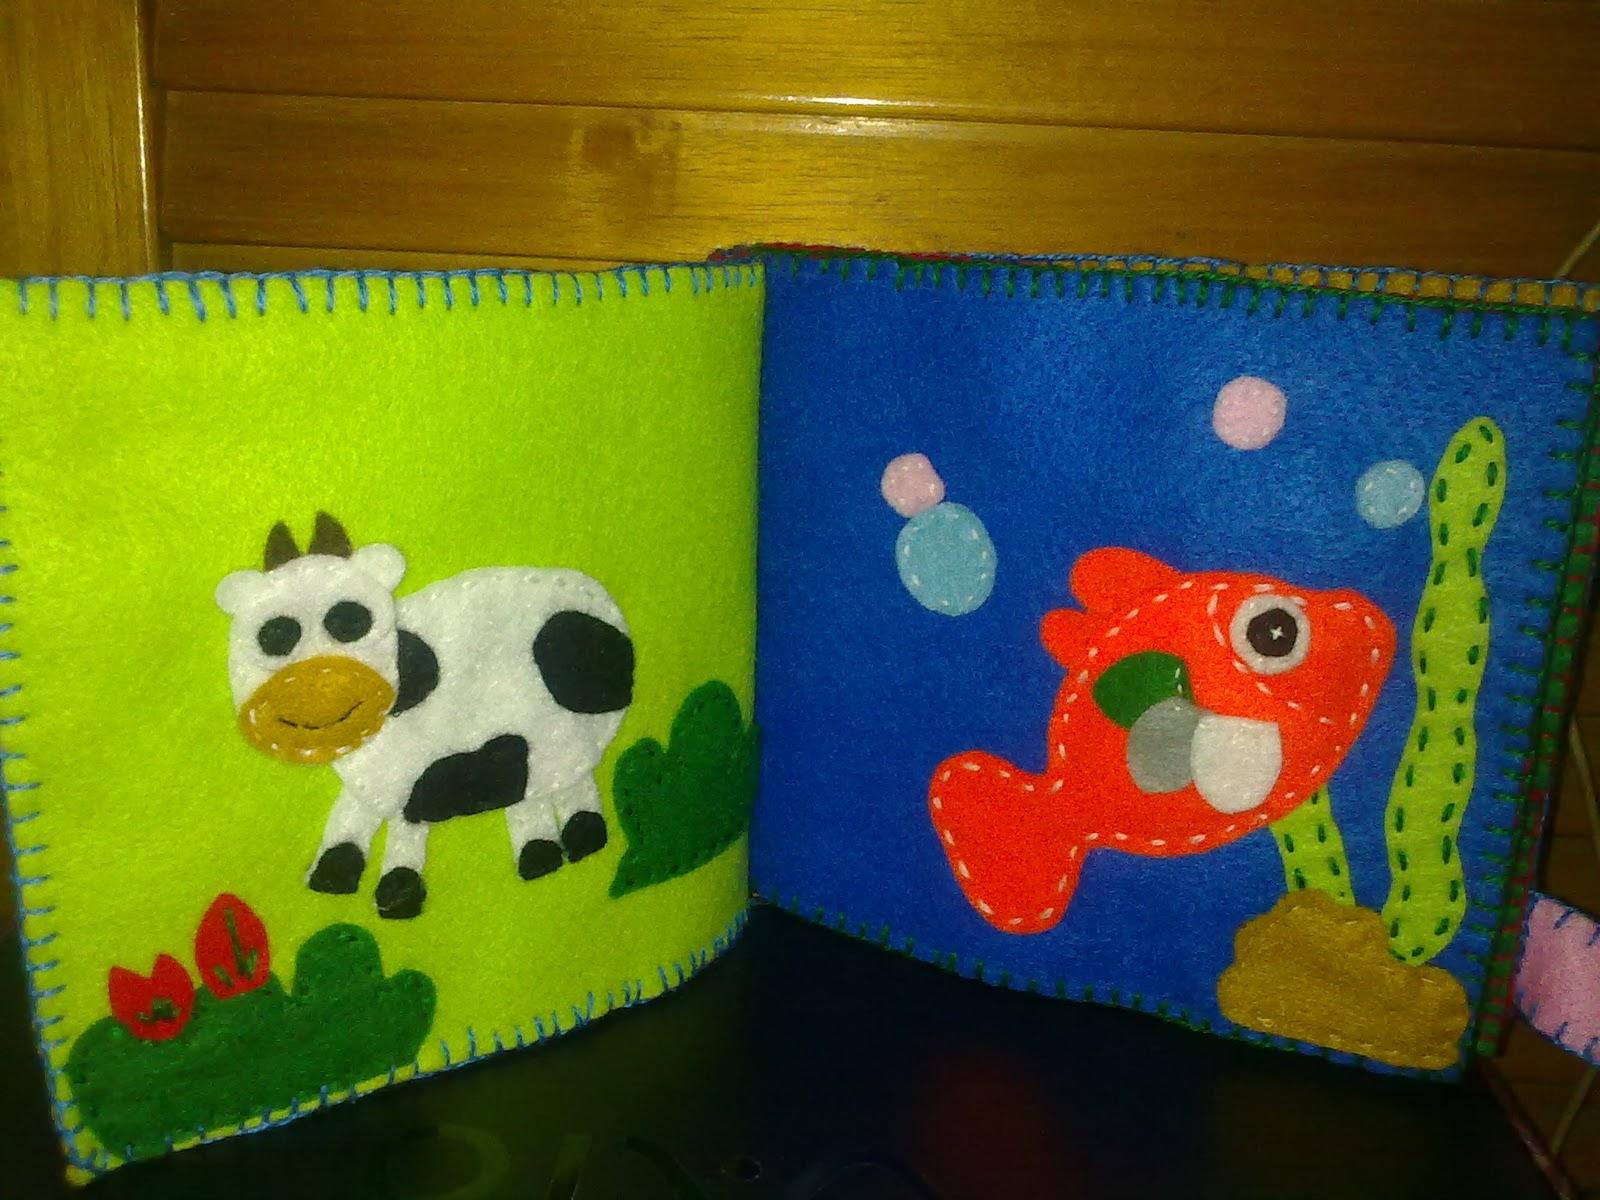 Felt craft book - Education Felt Book For Baby Animal Series 1